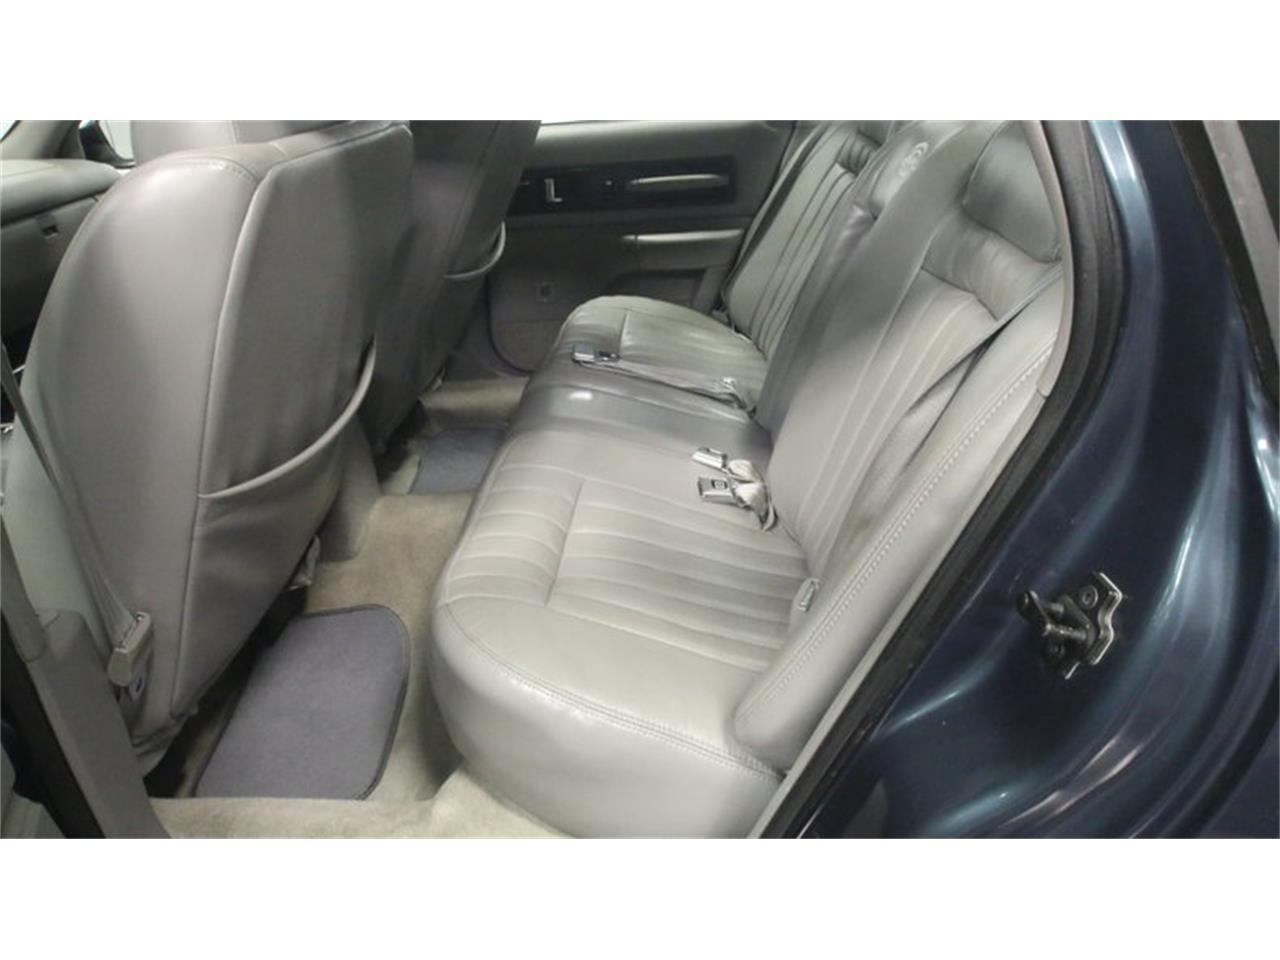 1996 Chevrolet Impala (CC-1154634) for sale in Lithia Springs, Georgia